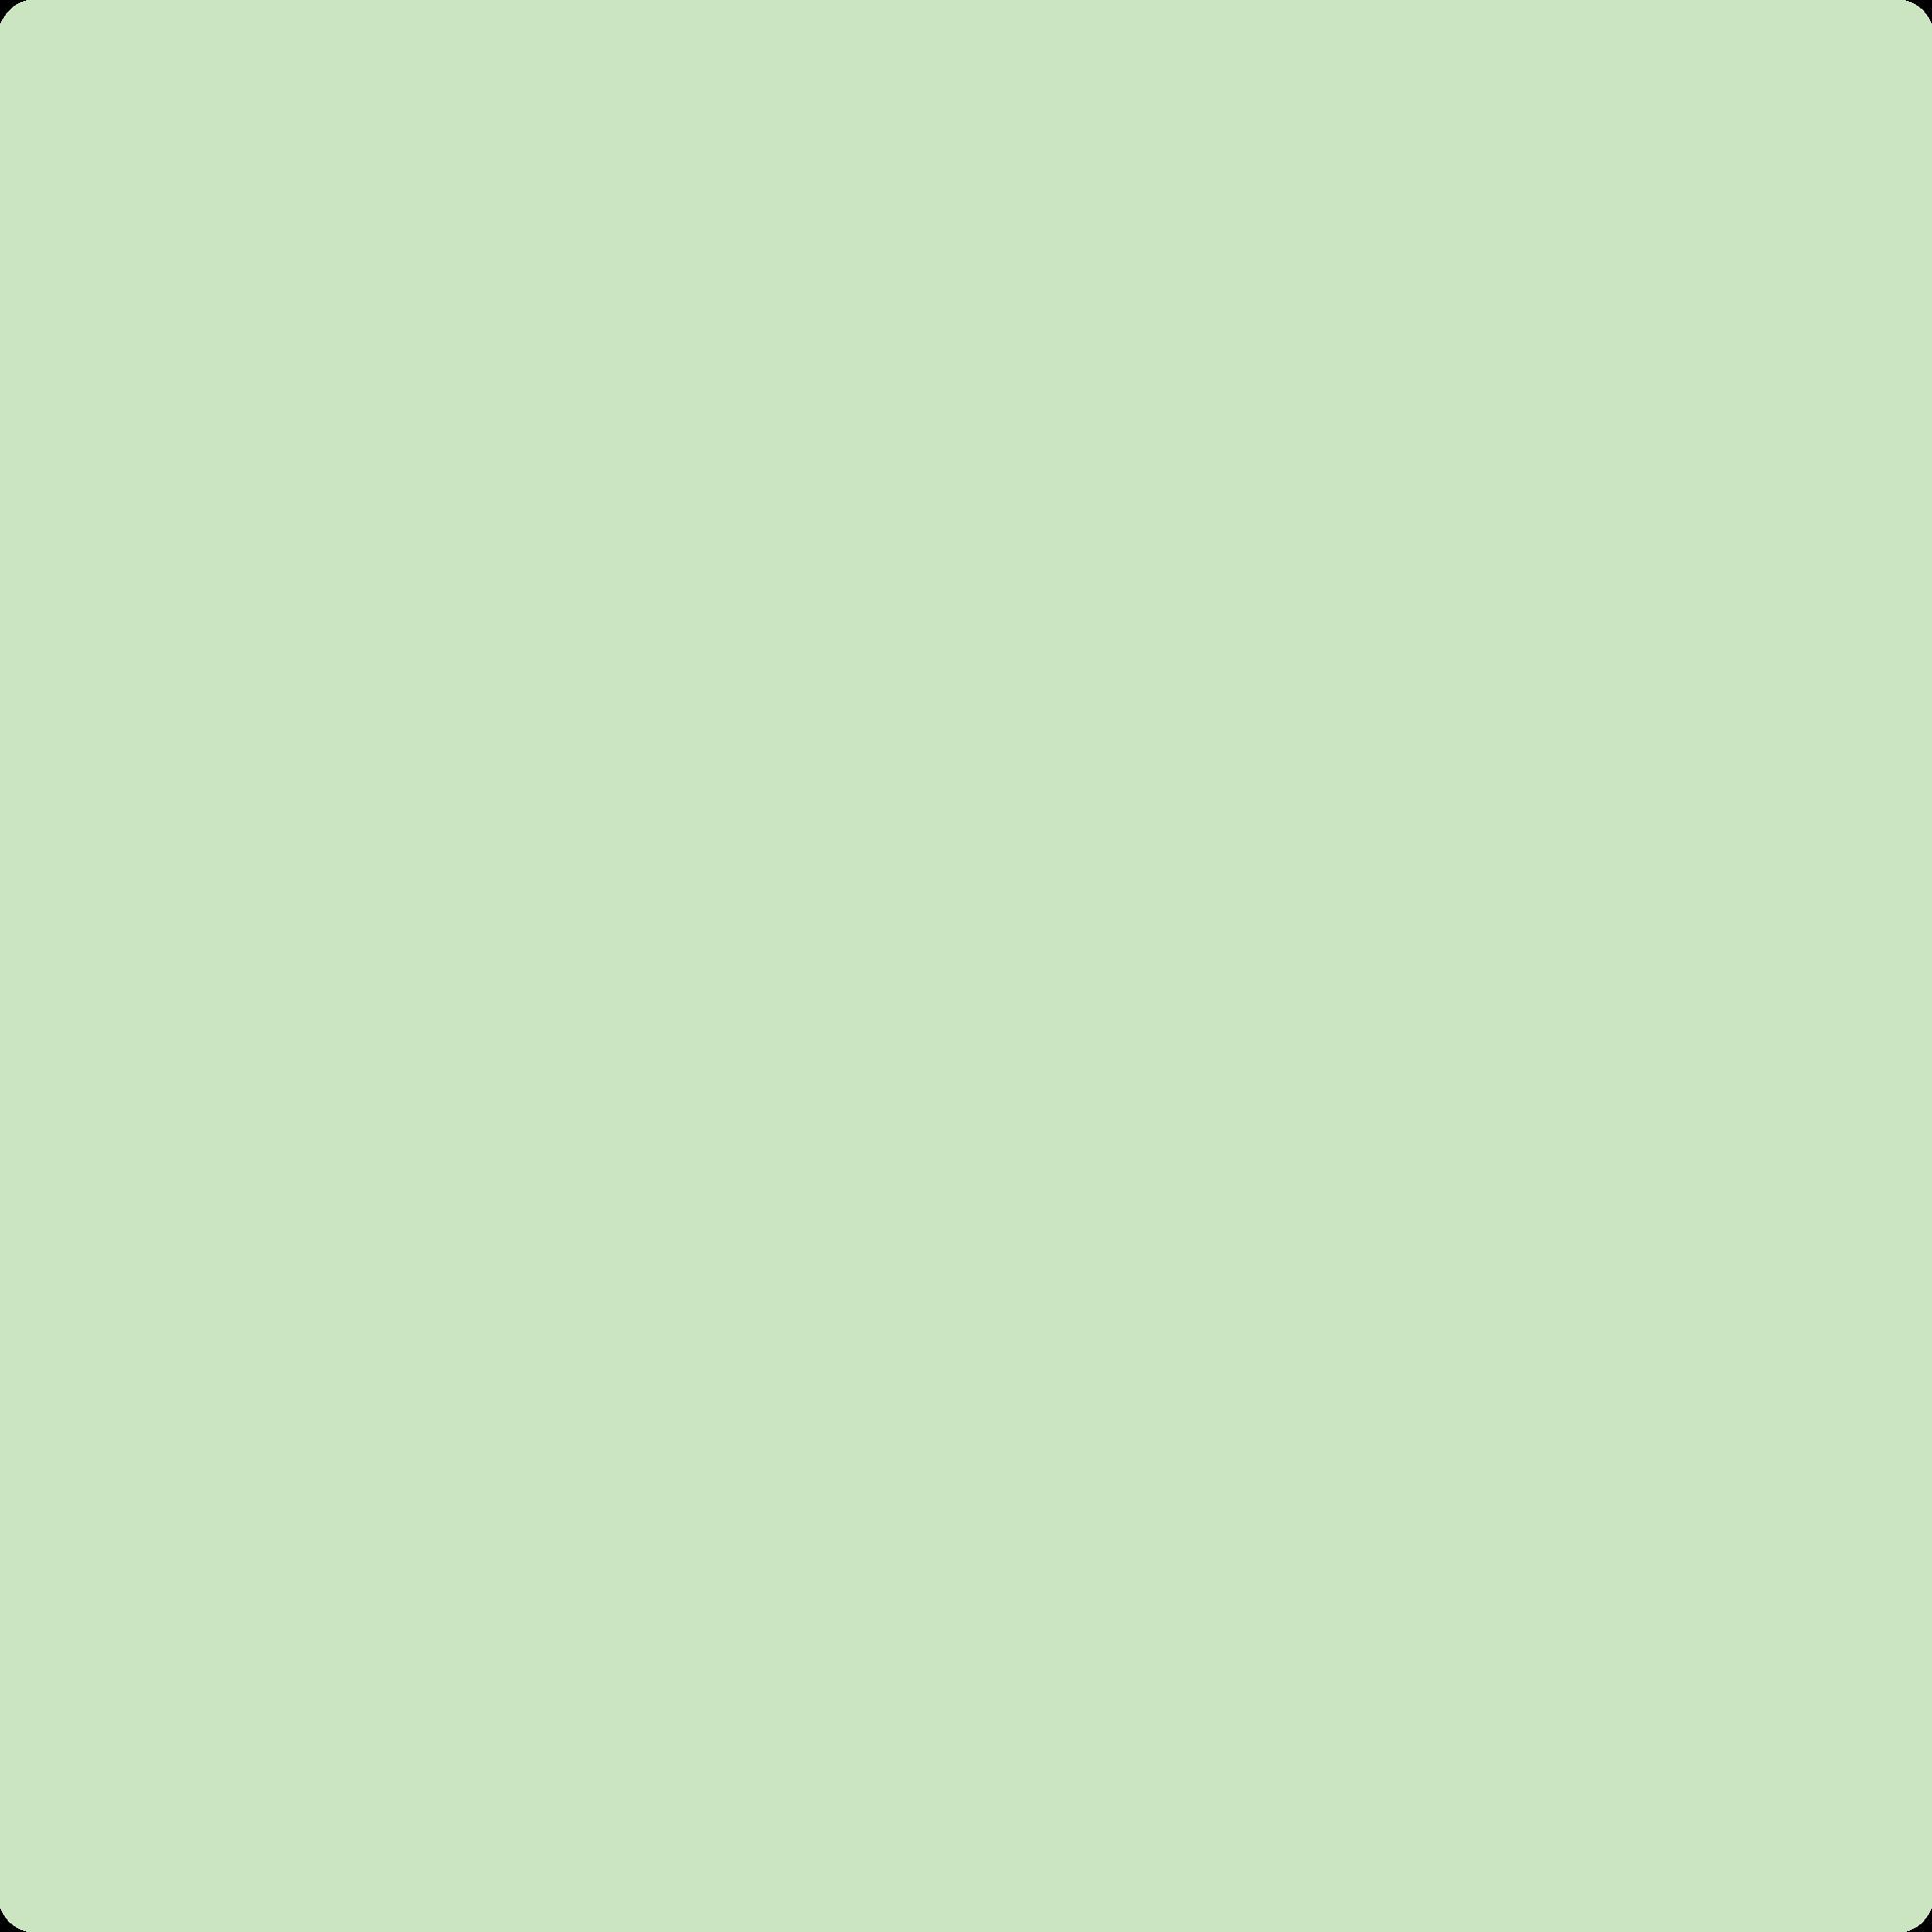 Pastel Green 548